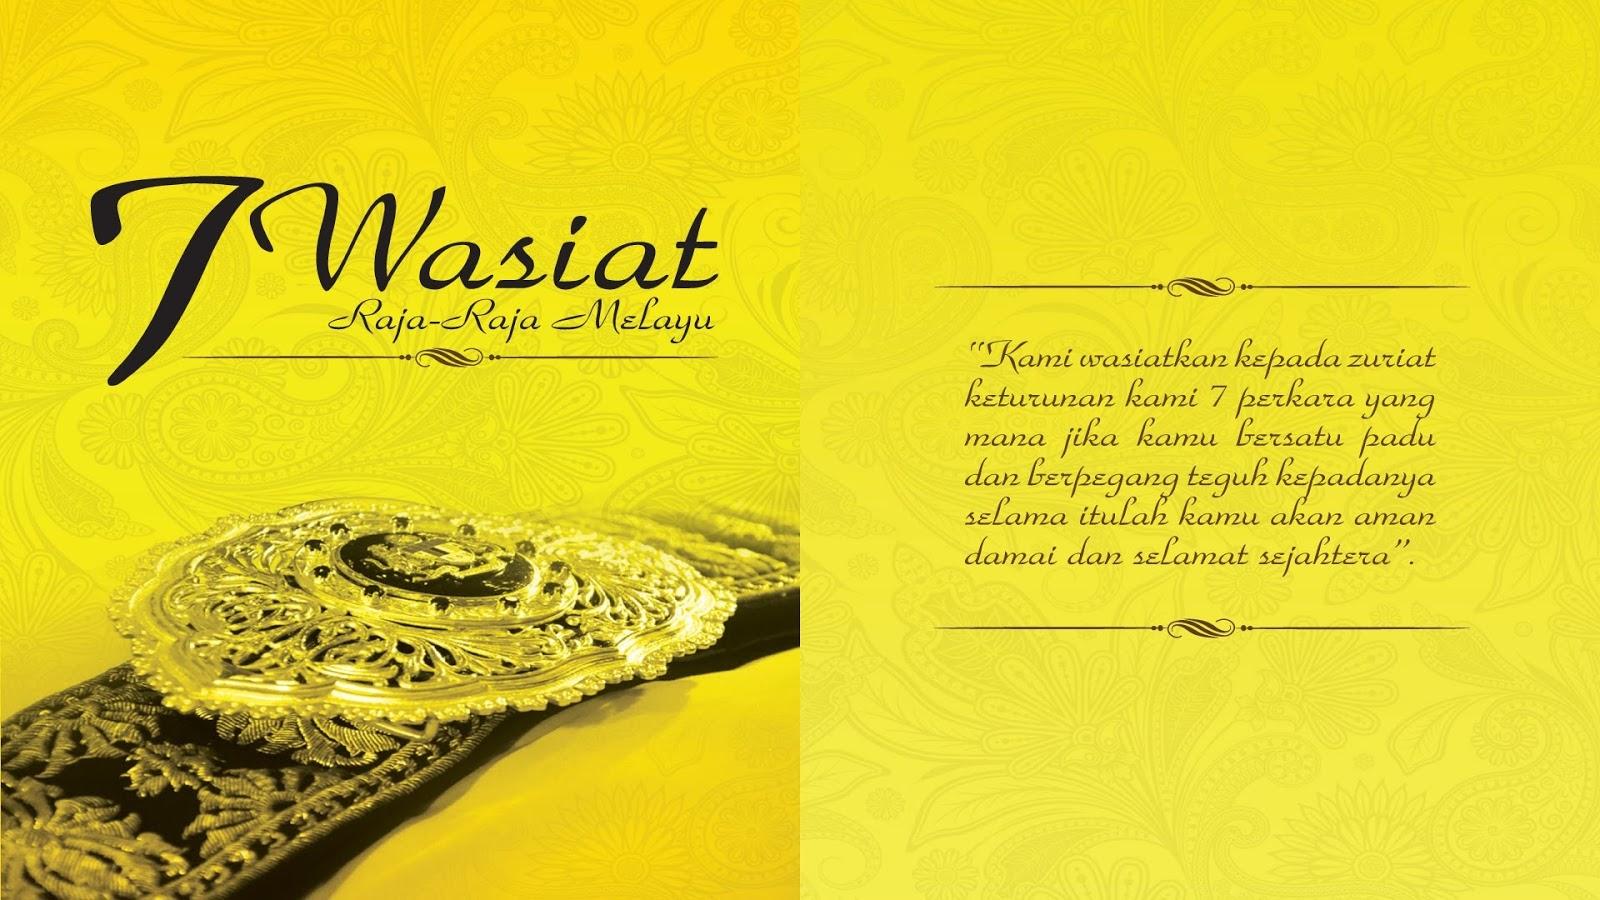 Wasiat Raja Raja Melayu